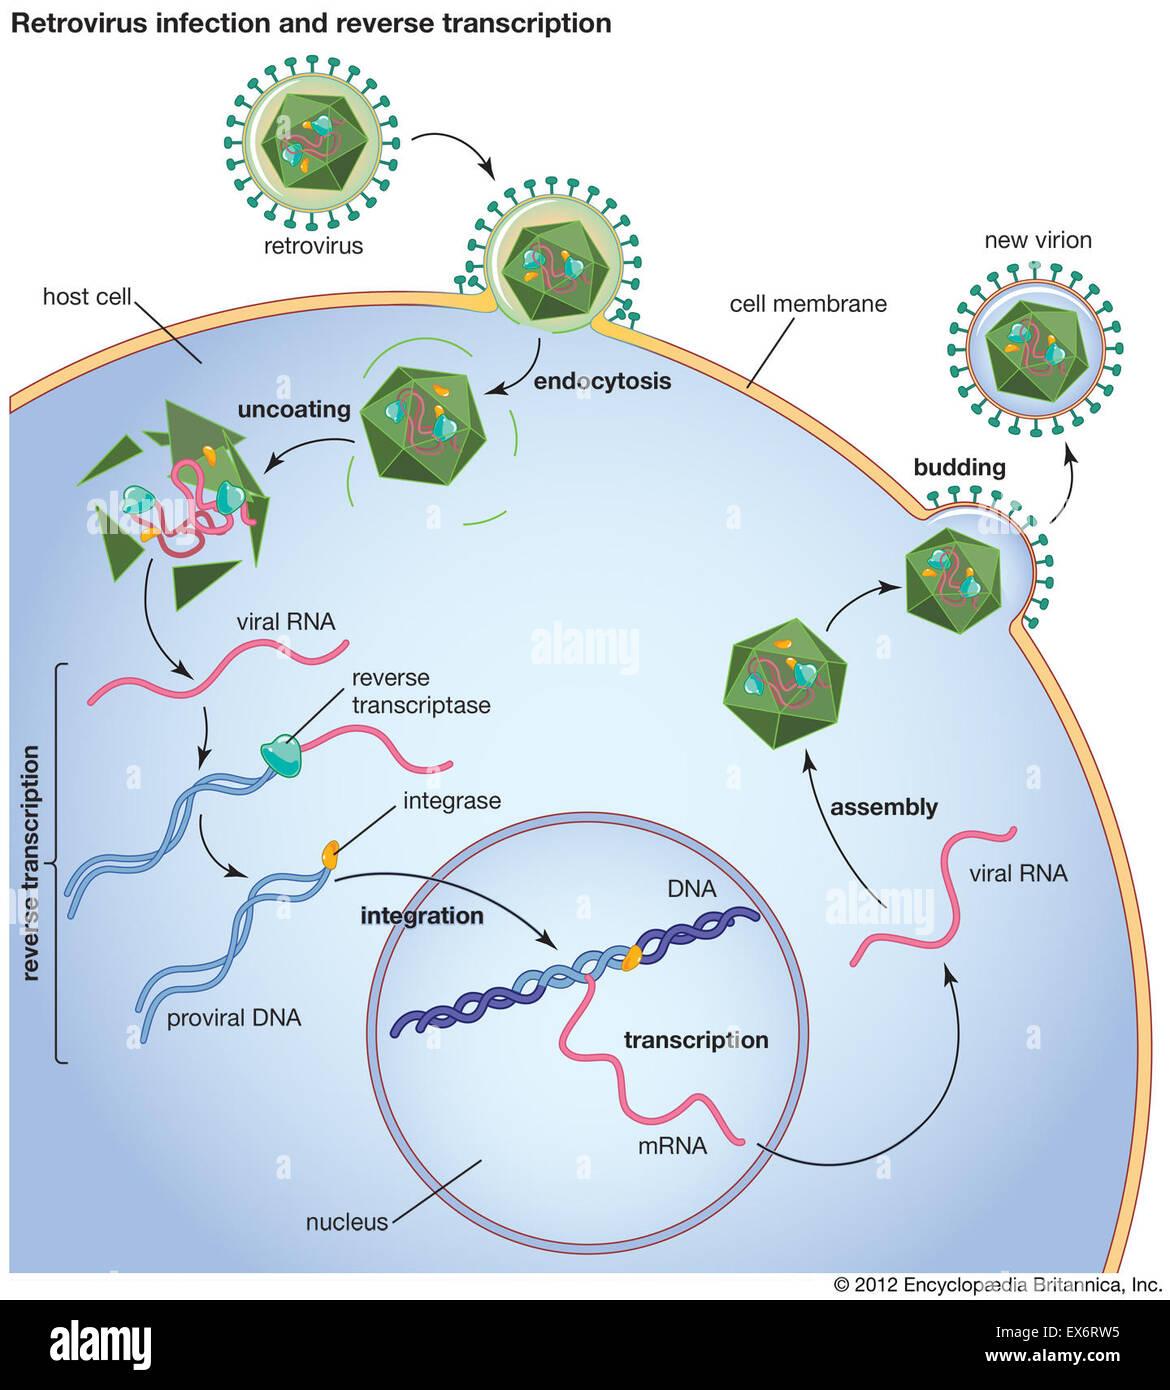 Retrovirus infection and reverse transcription Stock Photo